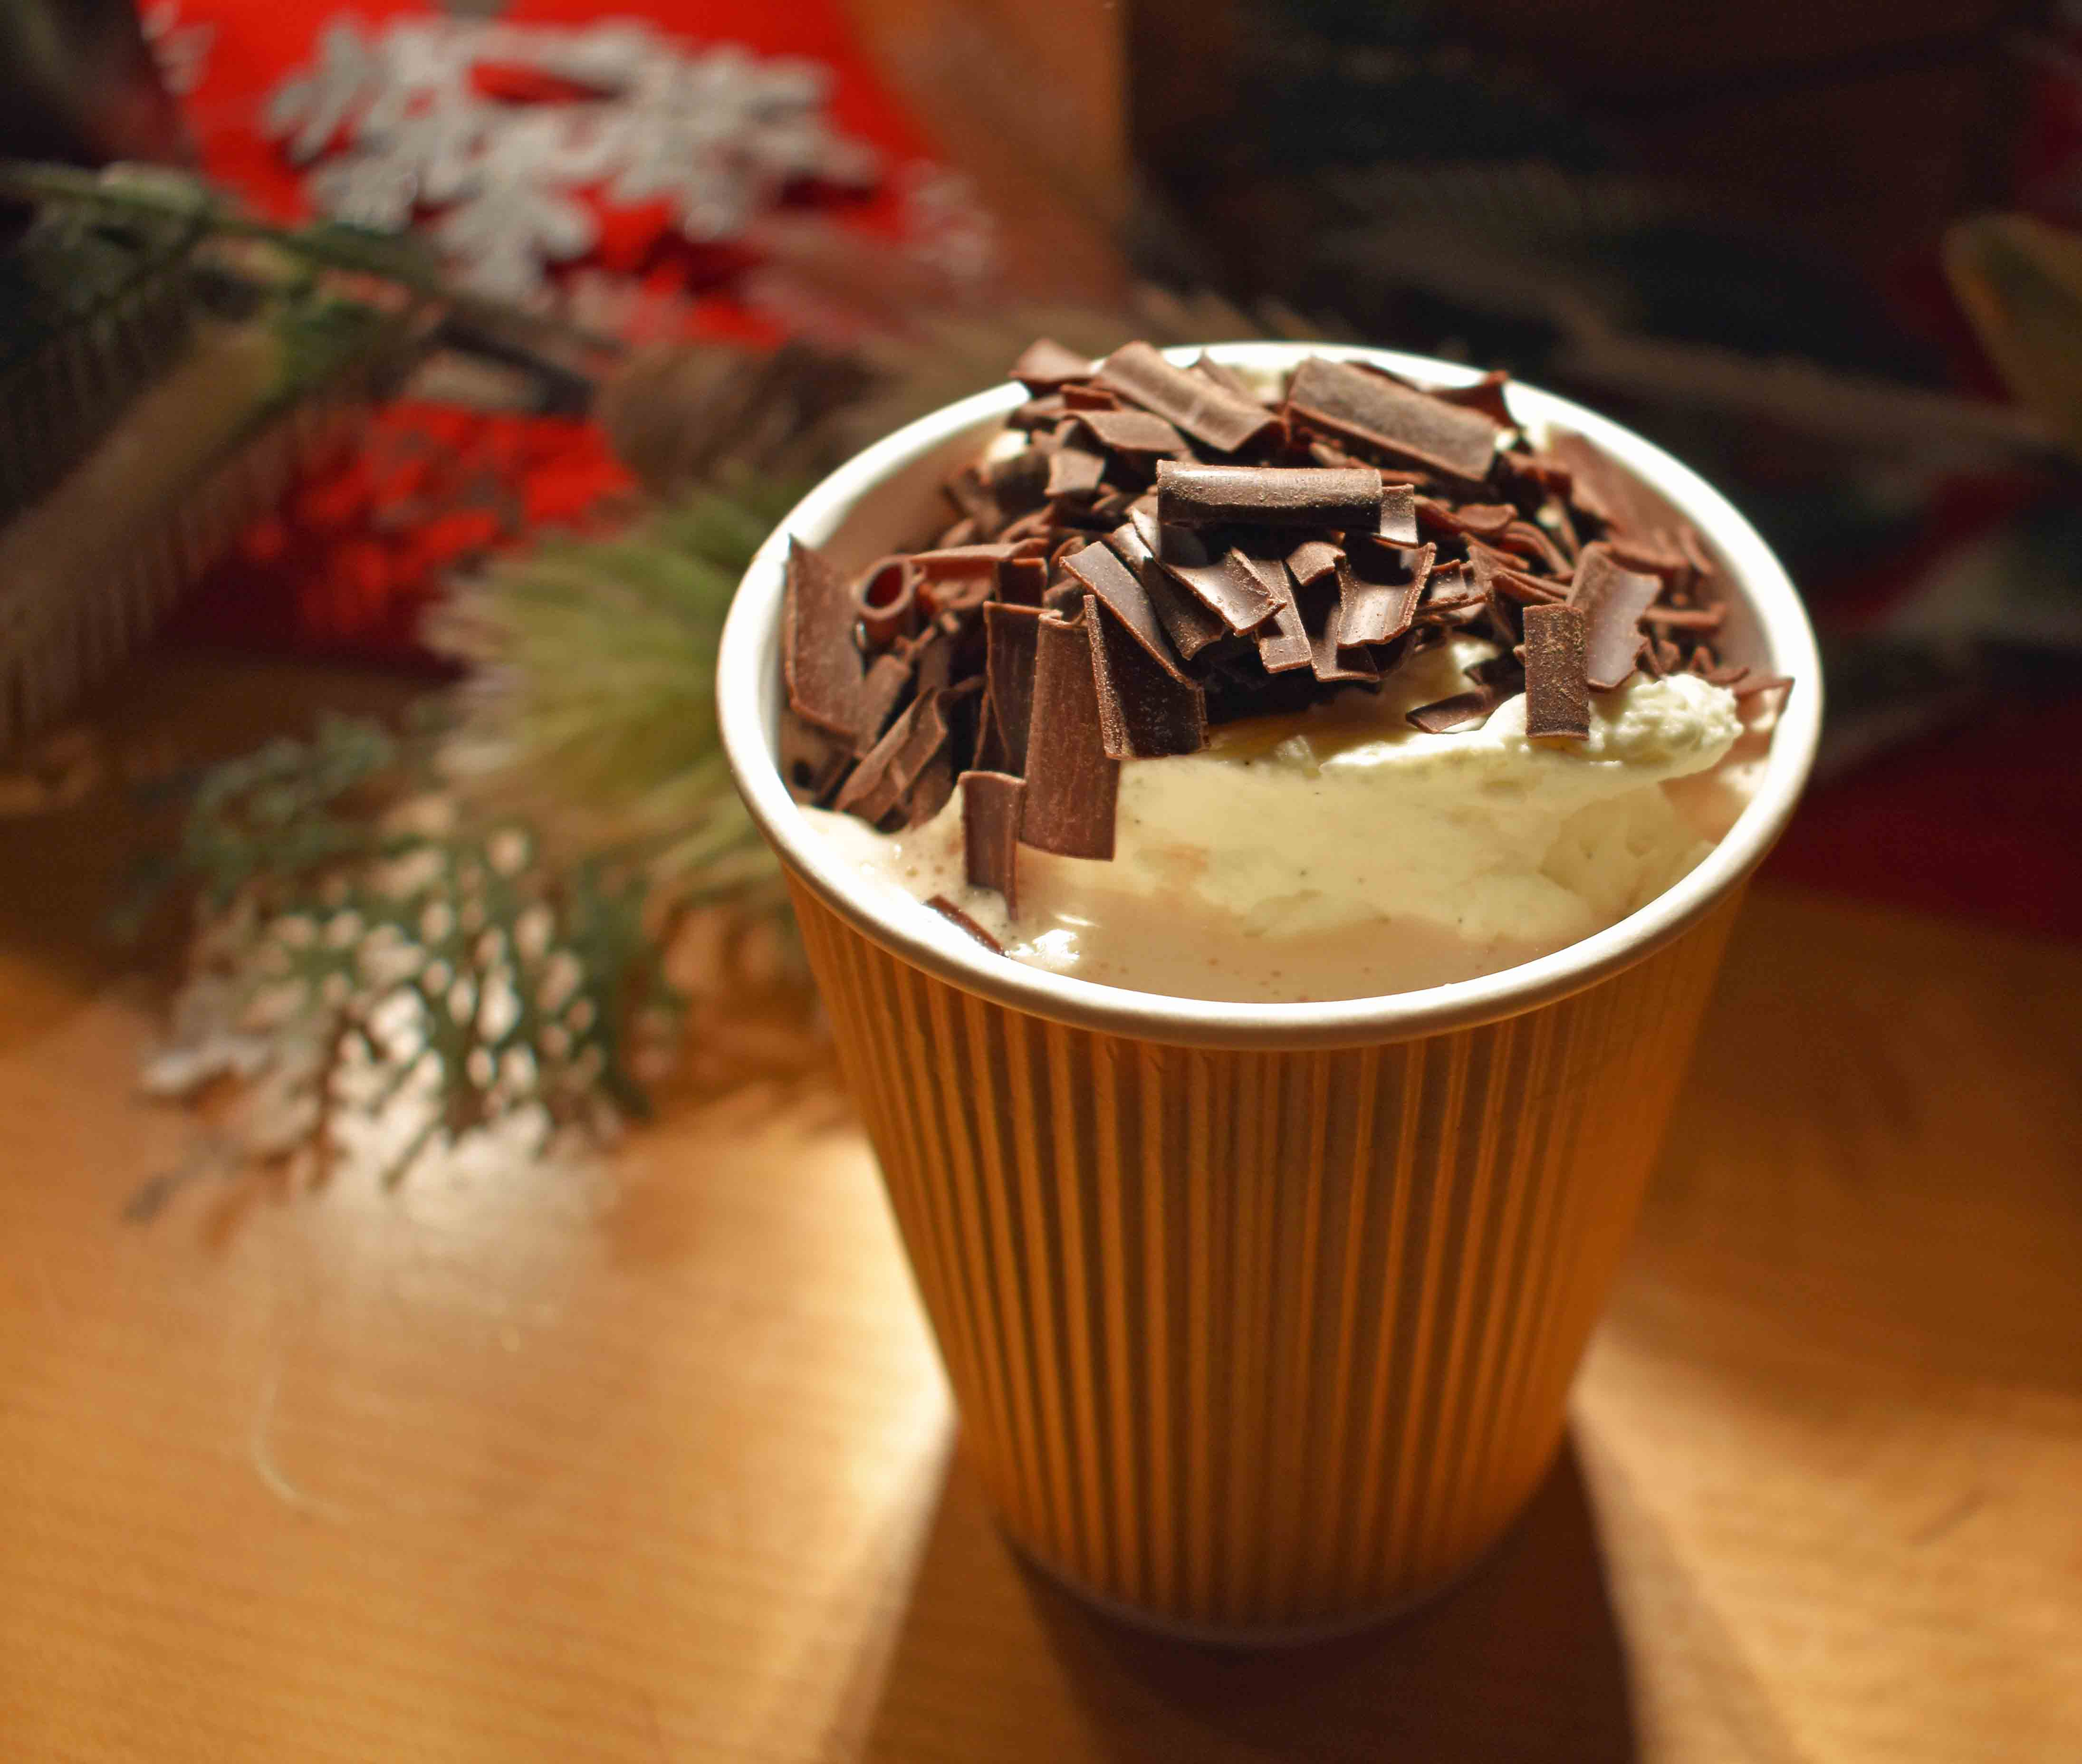 Arizona Four Seasons Christmas and Homemade Hot Chocolate. Four Seasons Scottsdale Troon North Festival Flicks.